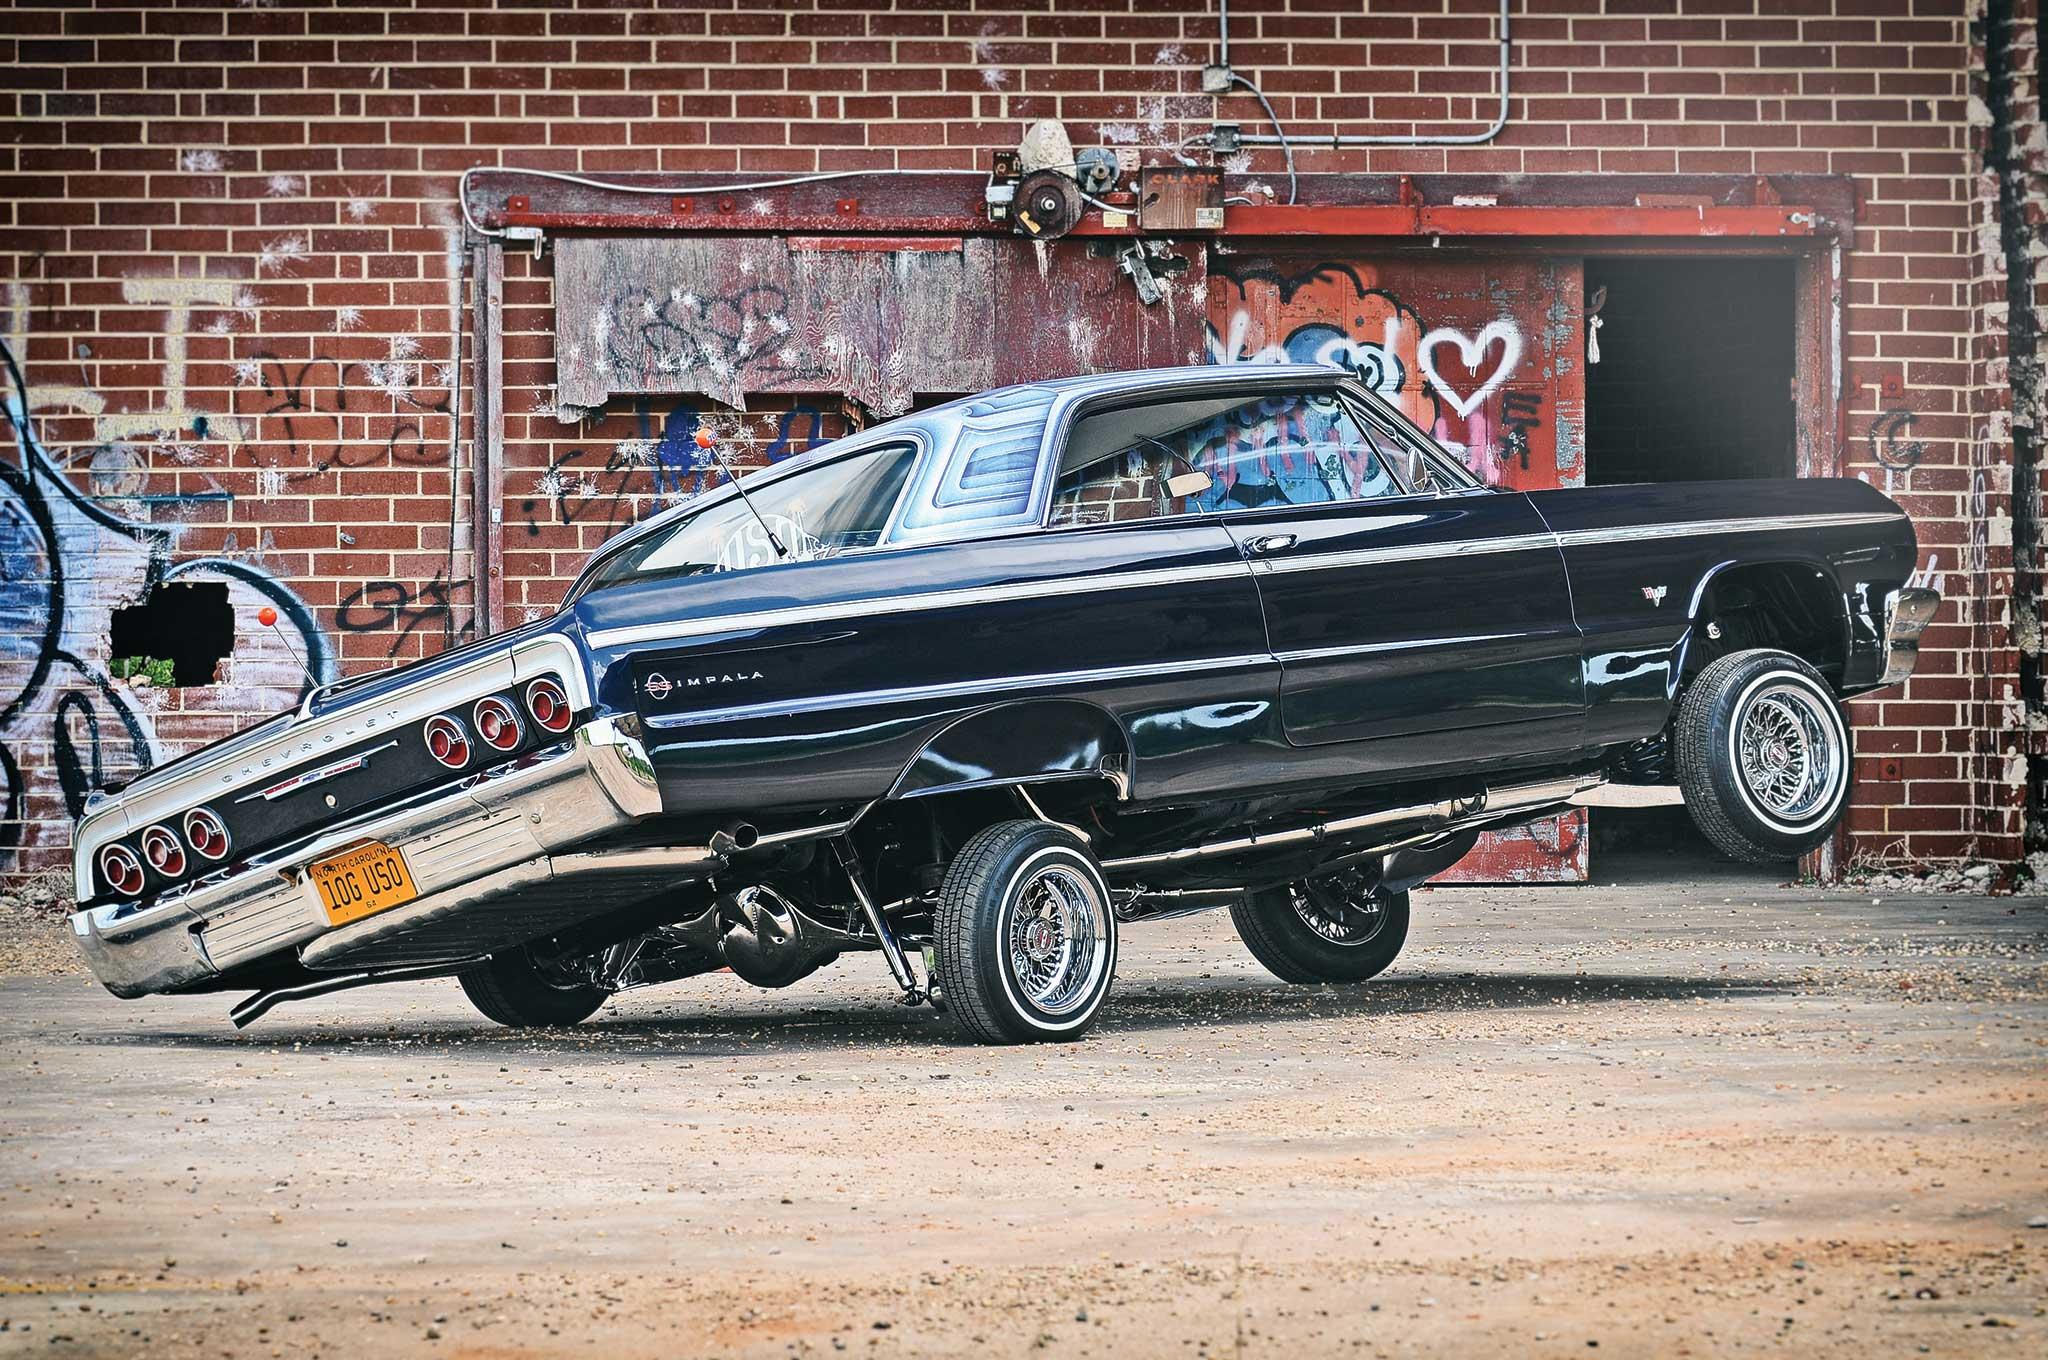 Lowrider Wallpaper Iphone 1964 Chevrolet Impala Super Sport Motivation